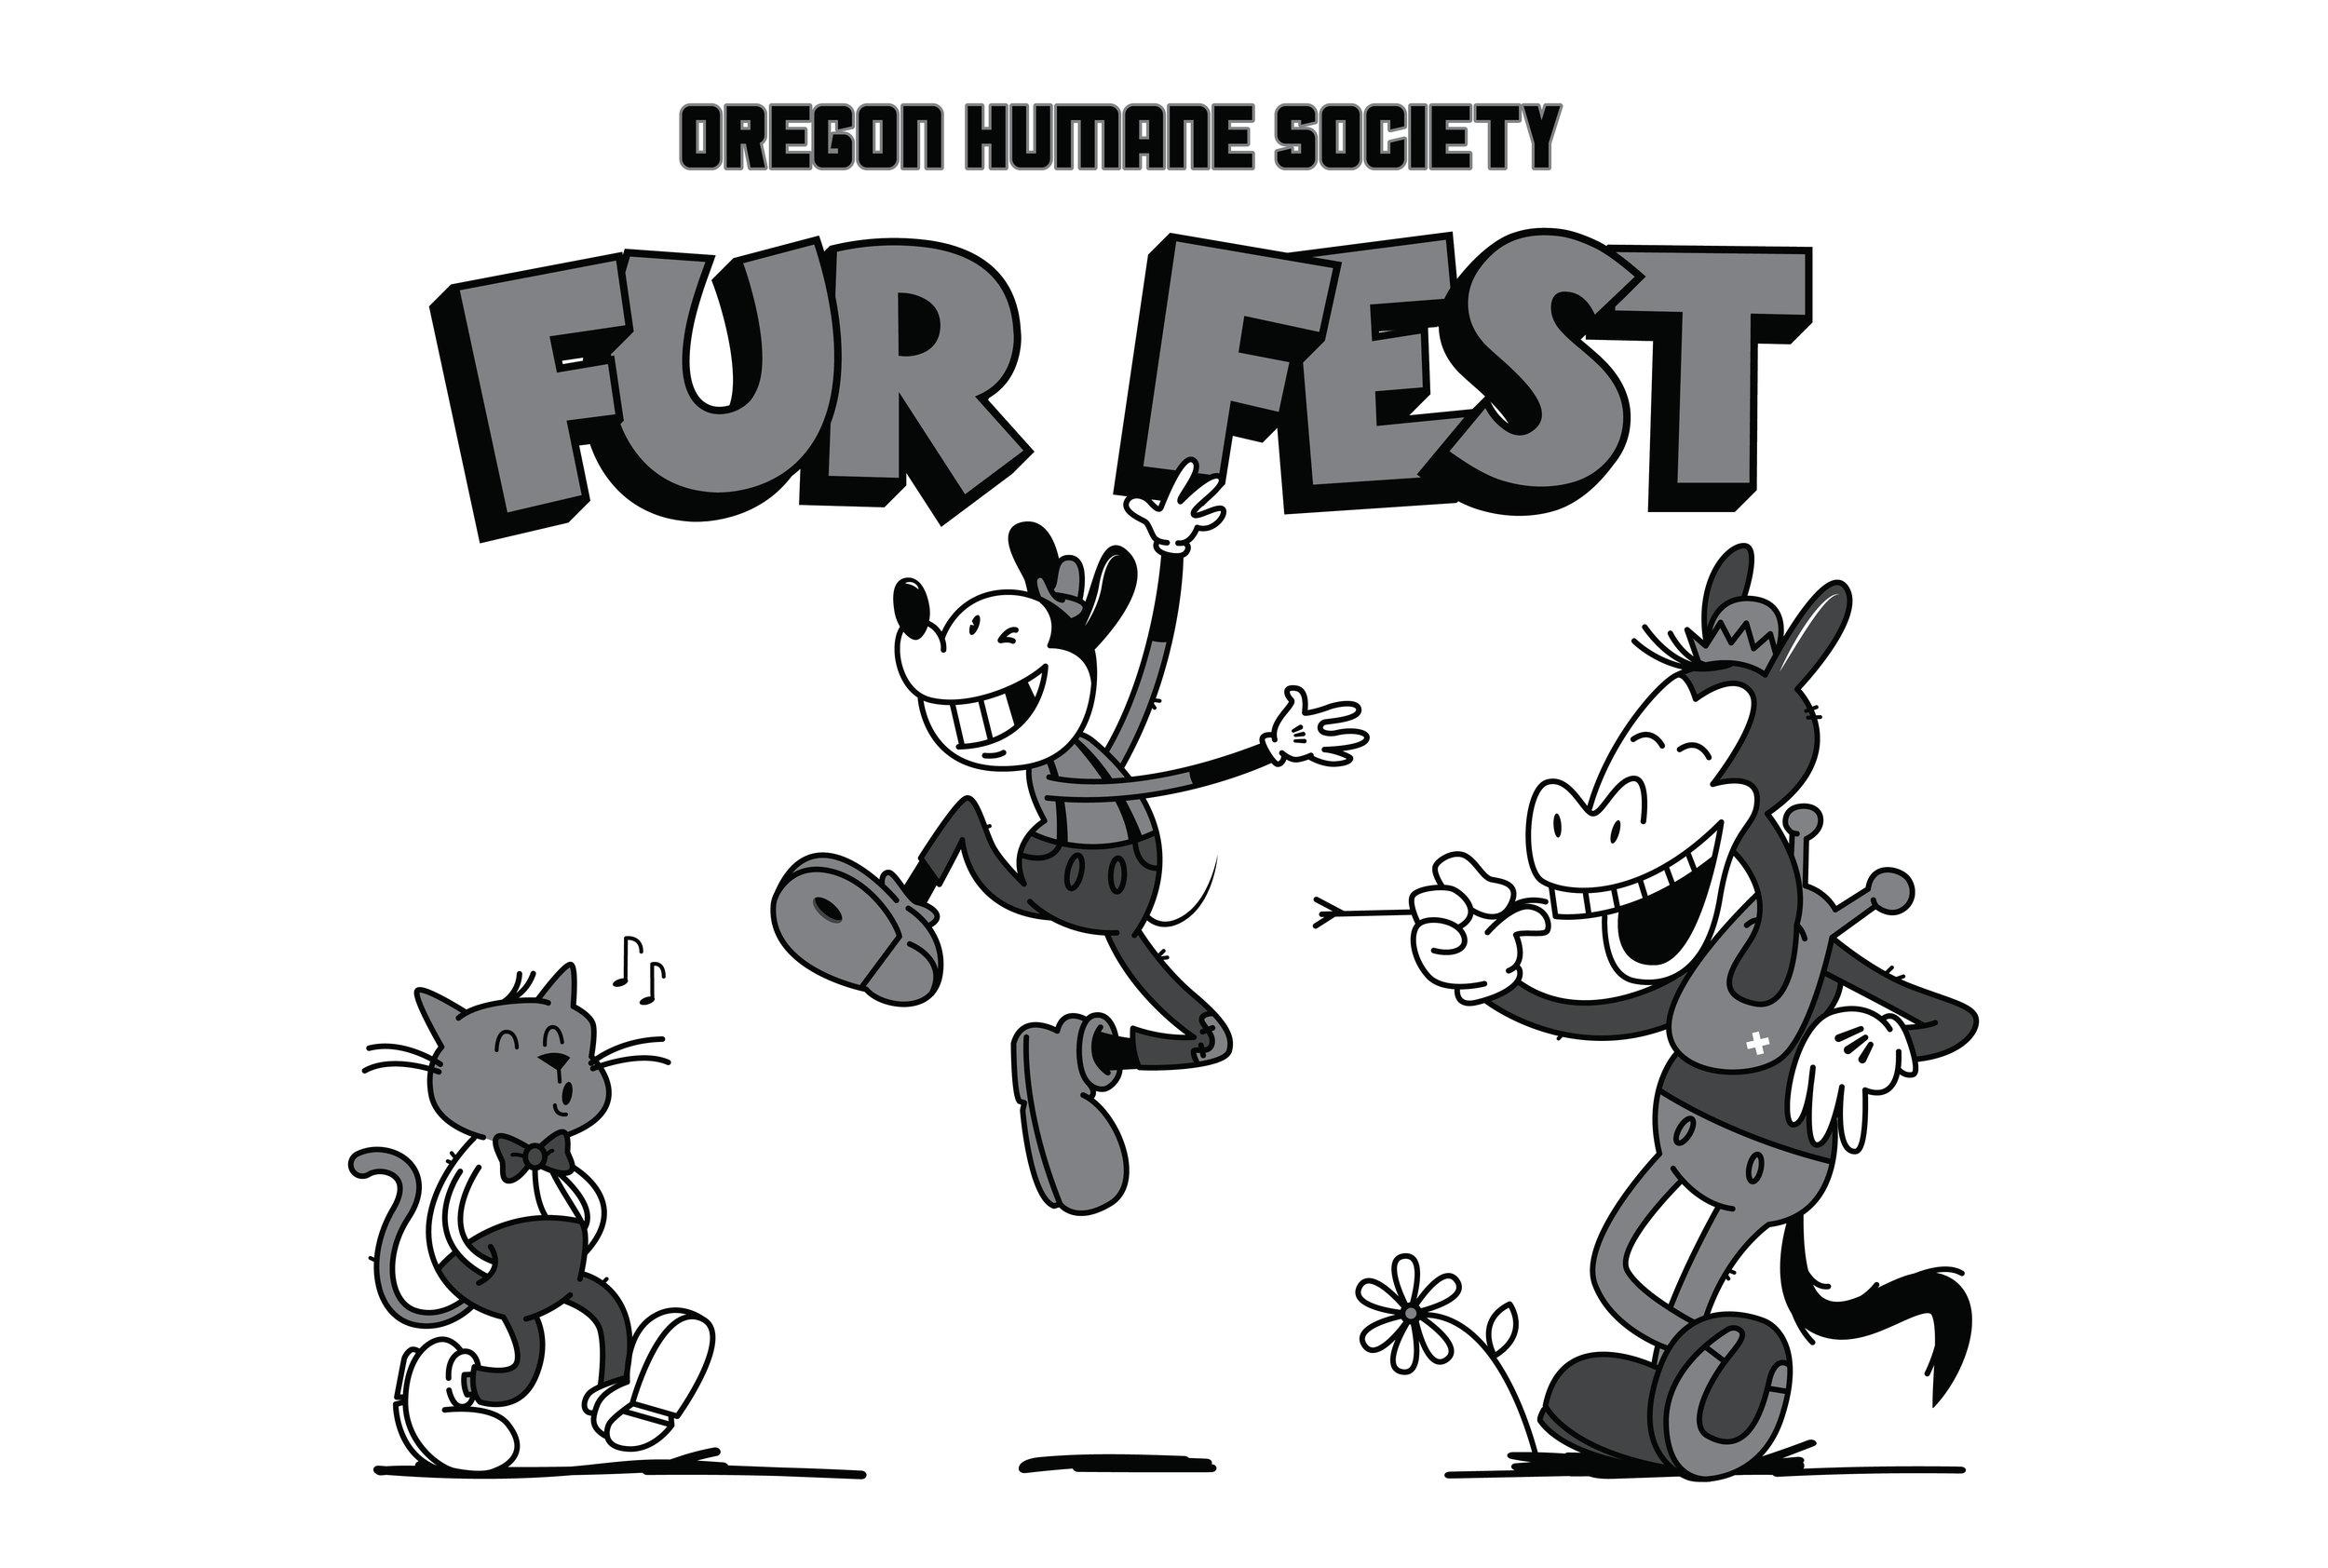 furfest_2018 copy-03.jpg